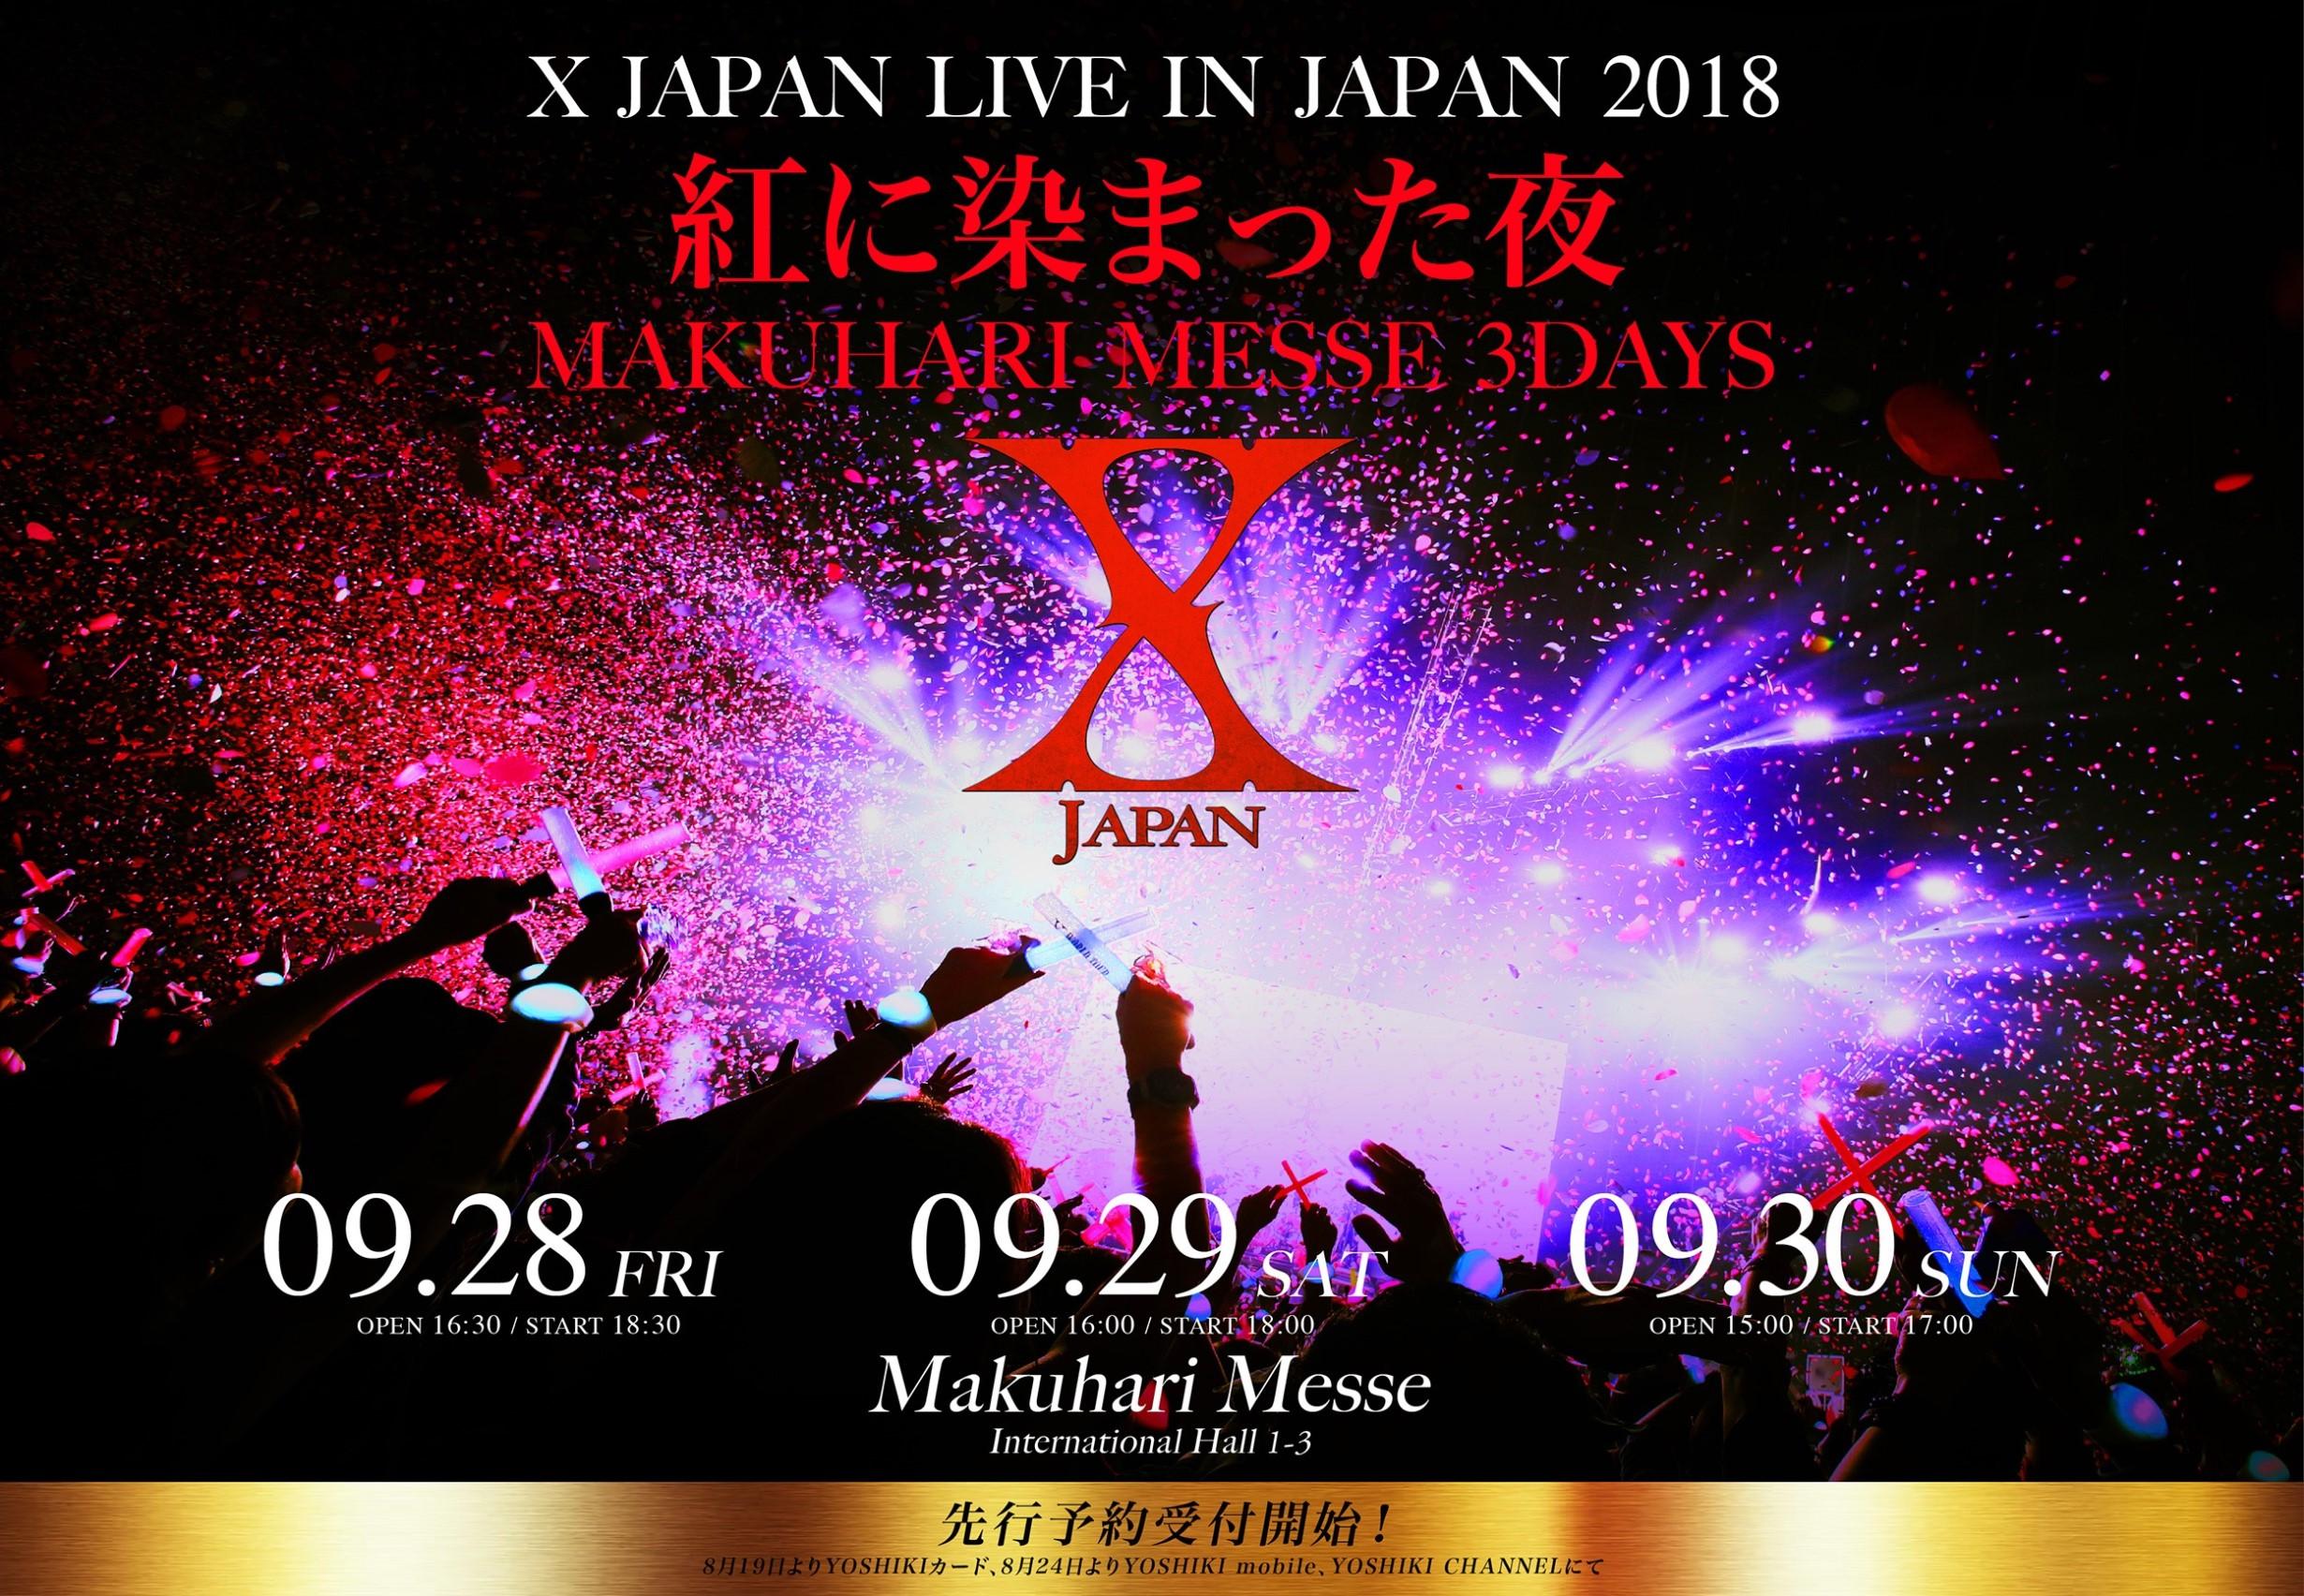 X JAPAN Live 日本公演 2018 〜紅に染まった夜〜Makuhari Messe 3Days